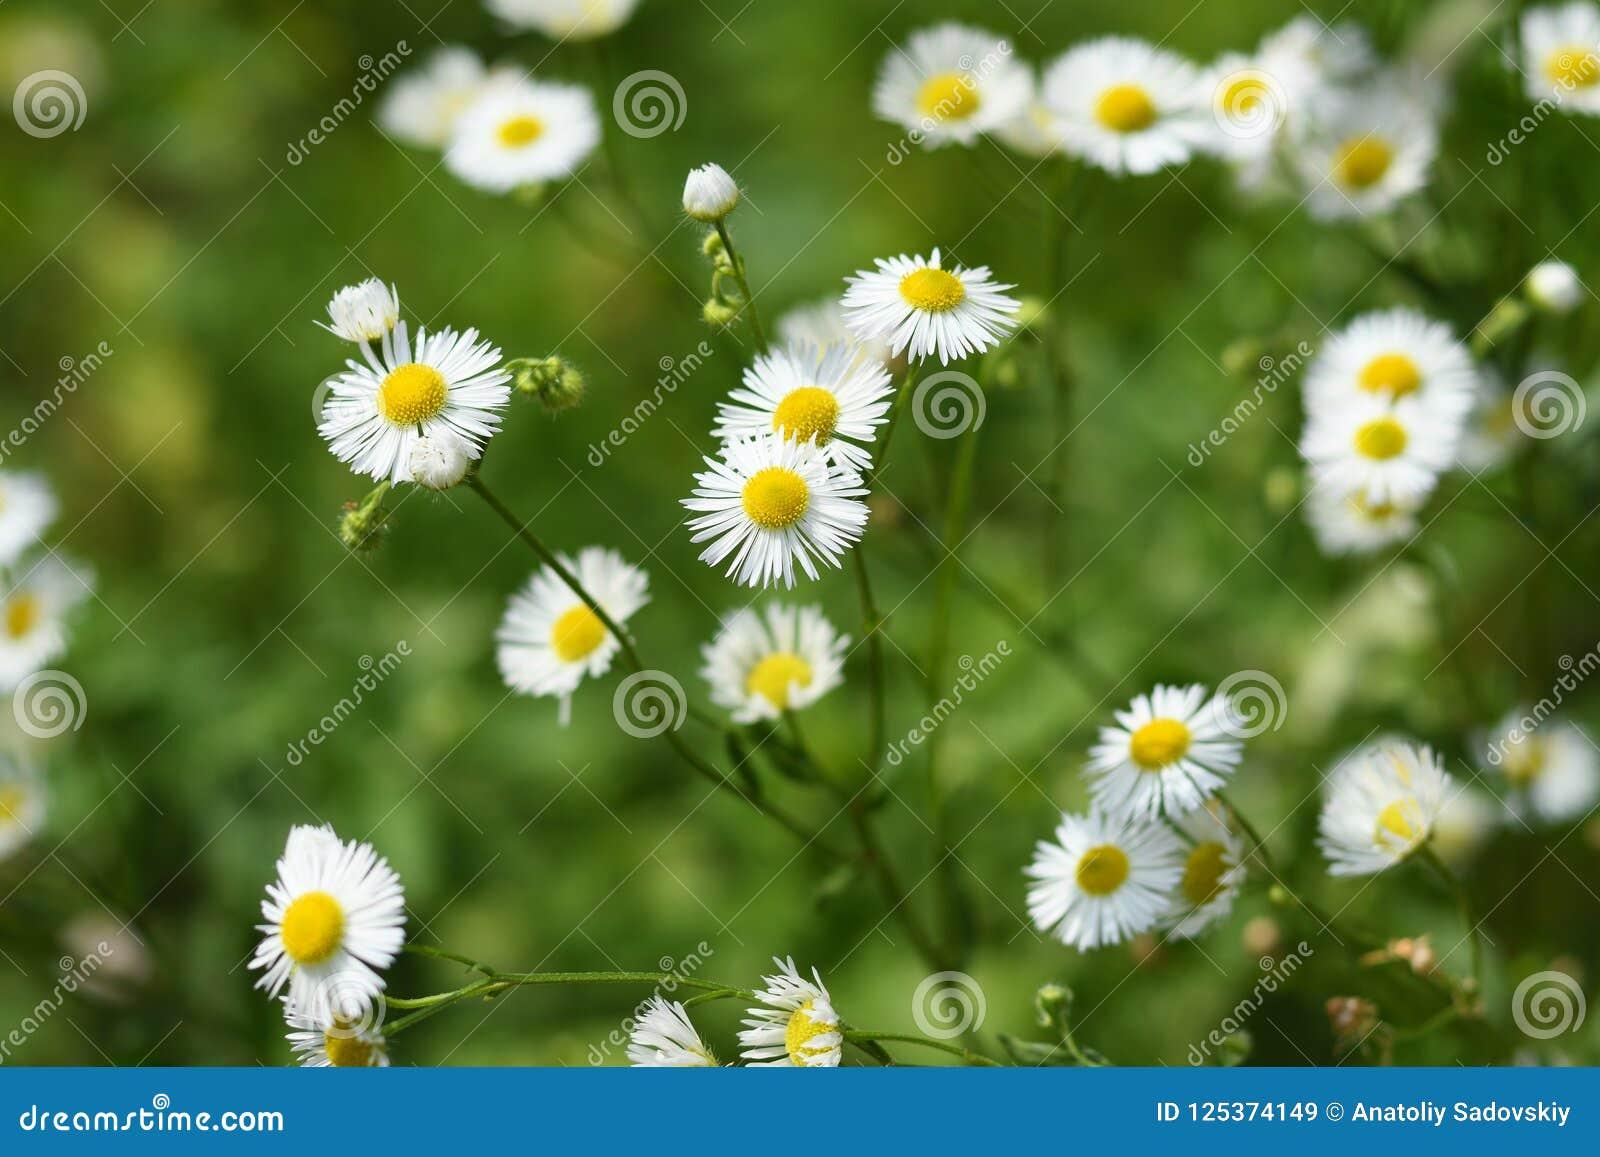 Wild daisy flowers stock image image of summer daisy 125374149 download wild daisy flowers stock image image of summer daisy 125374149 izmirmasajfo